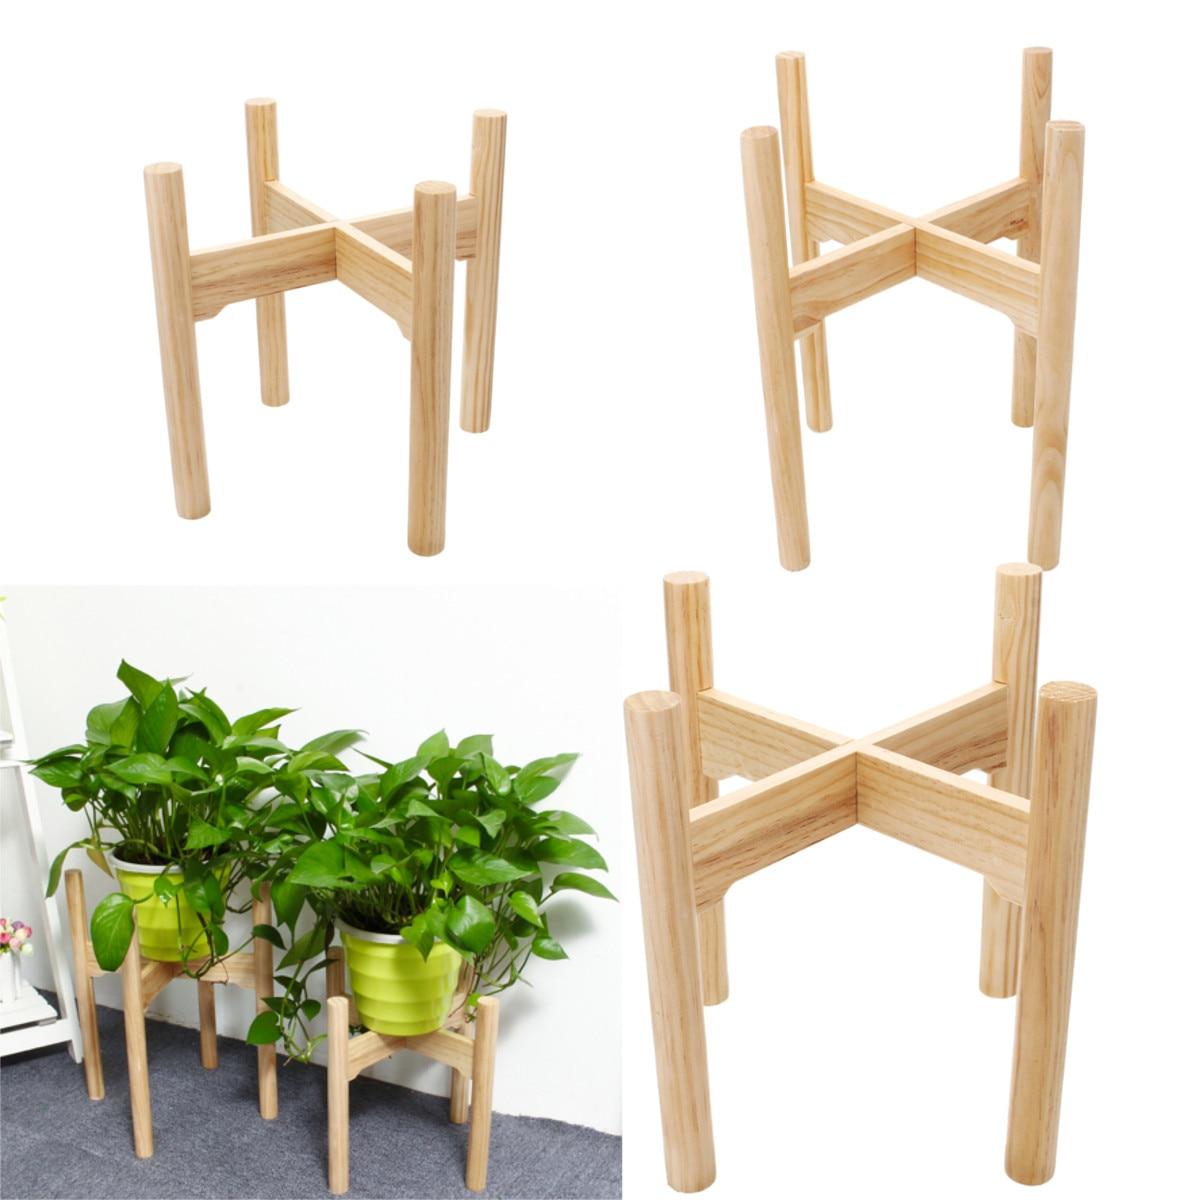 Furniture New Wooden Plant Stand Flower Pot Garden Rack Stand Flower Display Storage Rack Wood Shelf